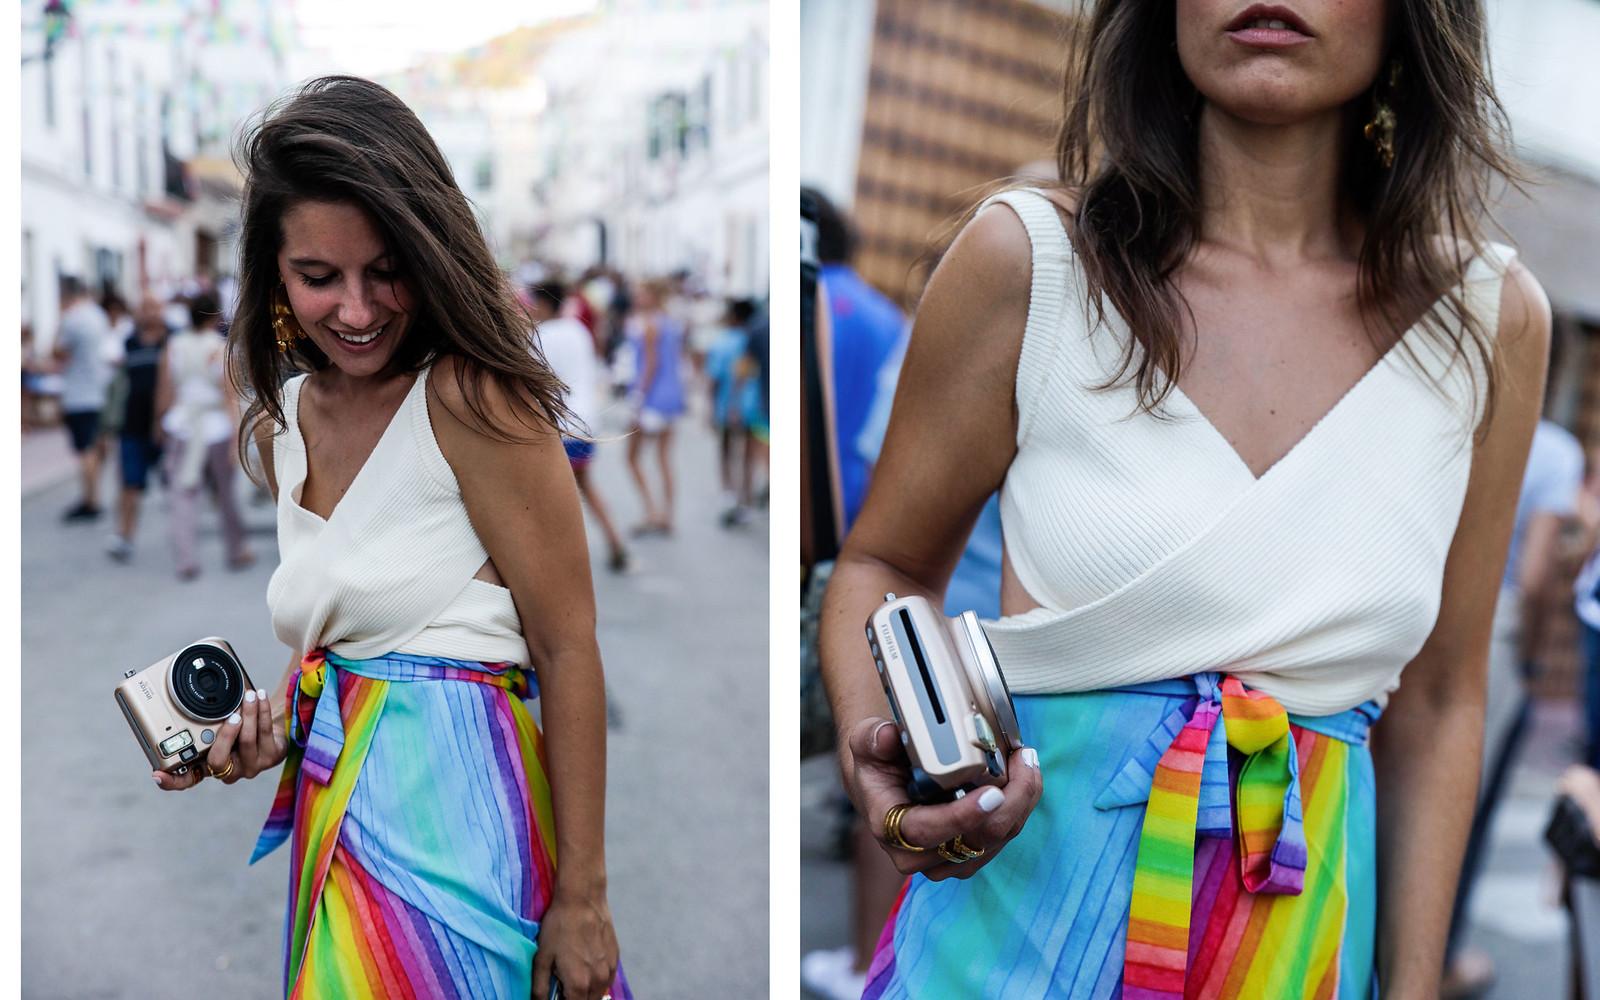 011_falda_arcoiris_top_crudo_look_fiestas_menorca_verano_theguestgirl_fashion_blogger_minorca_summer_laura_santolaria_rayban_sunglasses